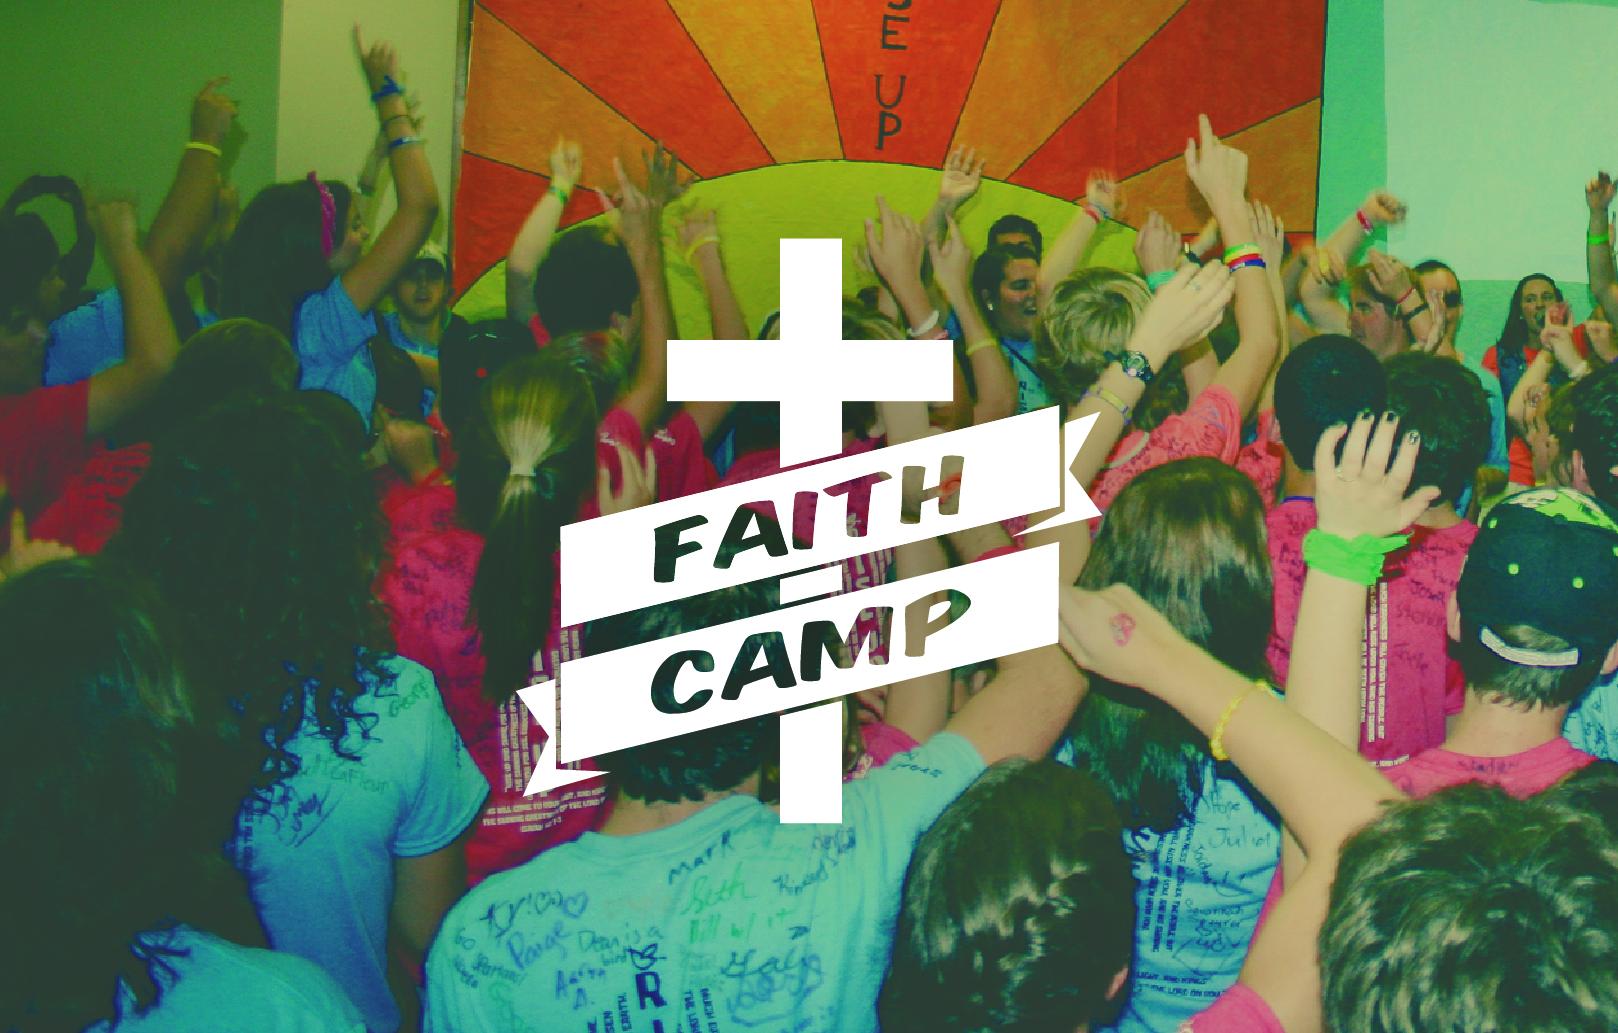 Faith Camp, catholic summer camp, youth